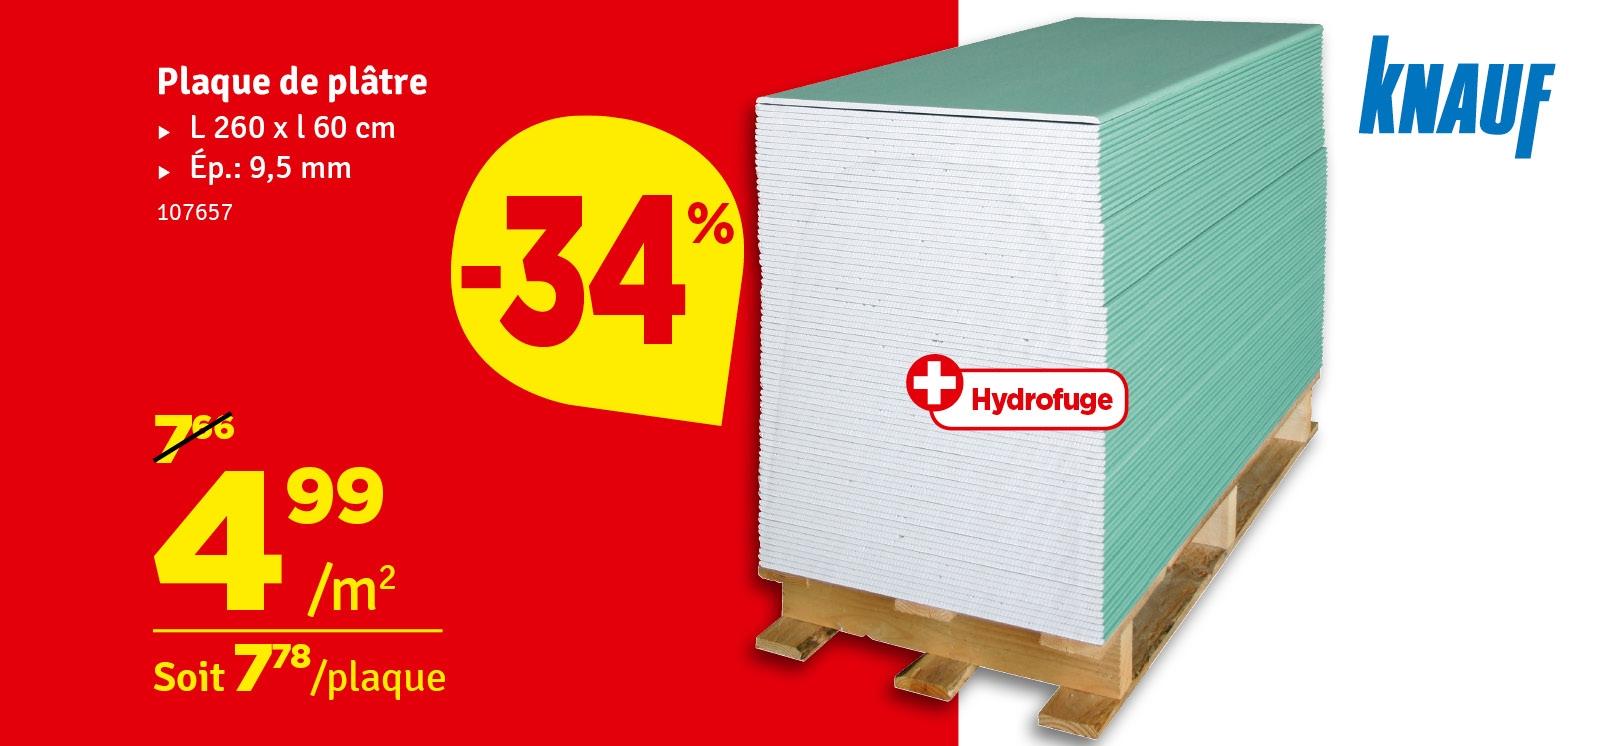 Promo - Plaque de plâtre hydrofuge Greenboard HRK 60 x 1 cm KNAUF